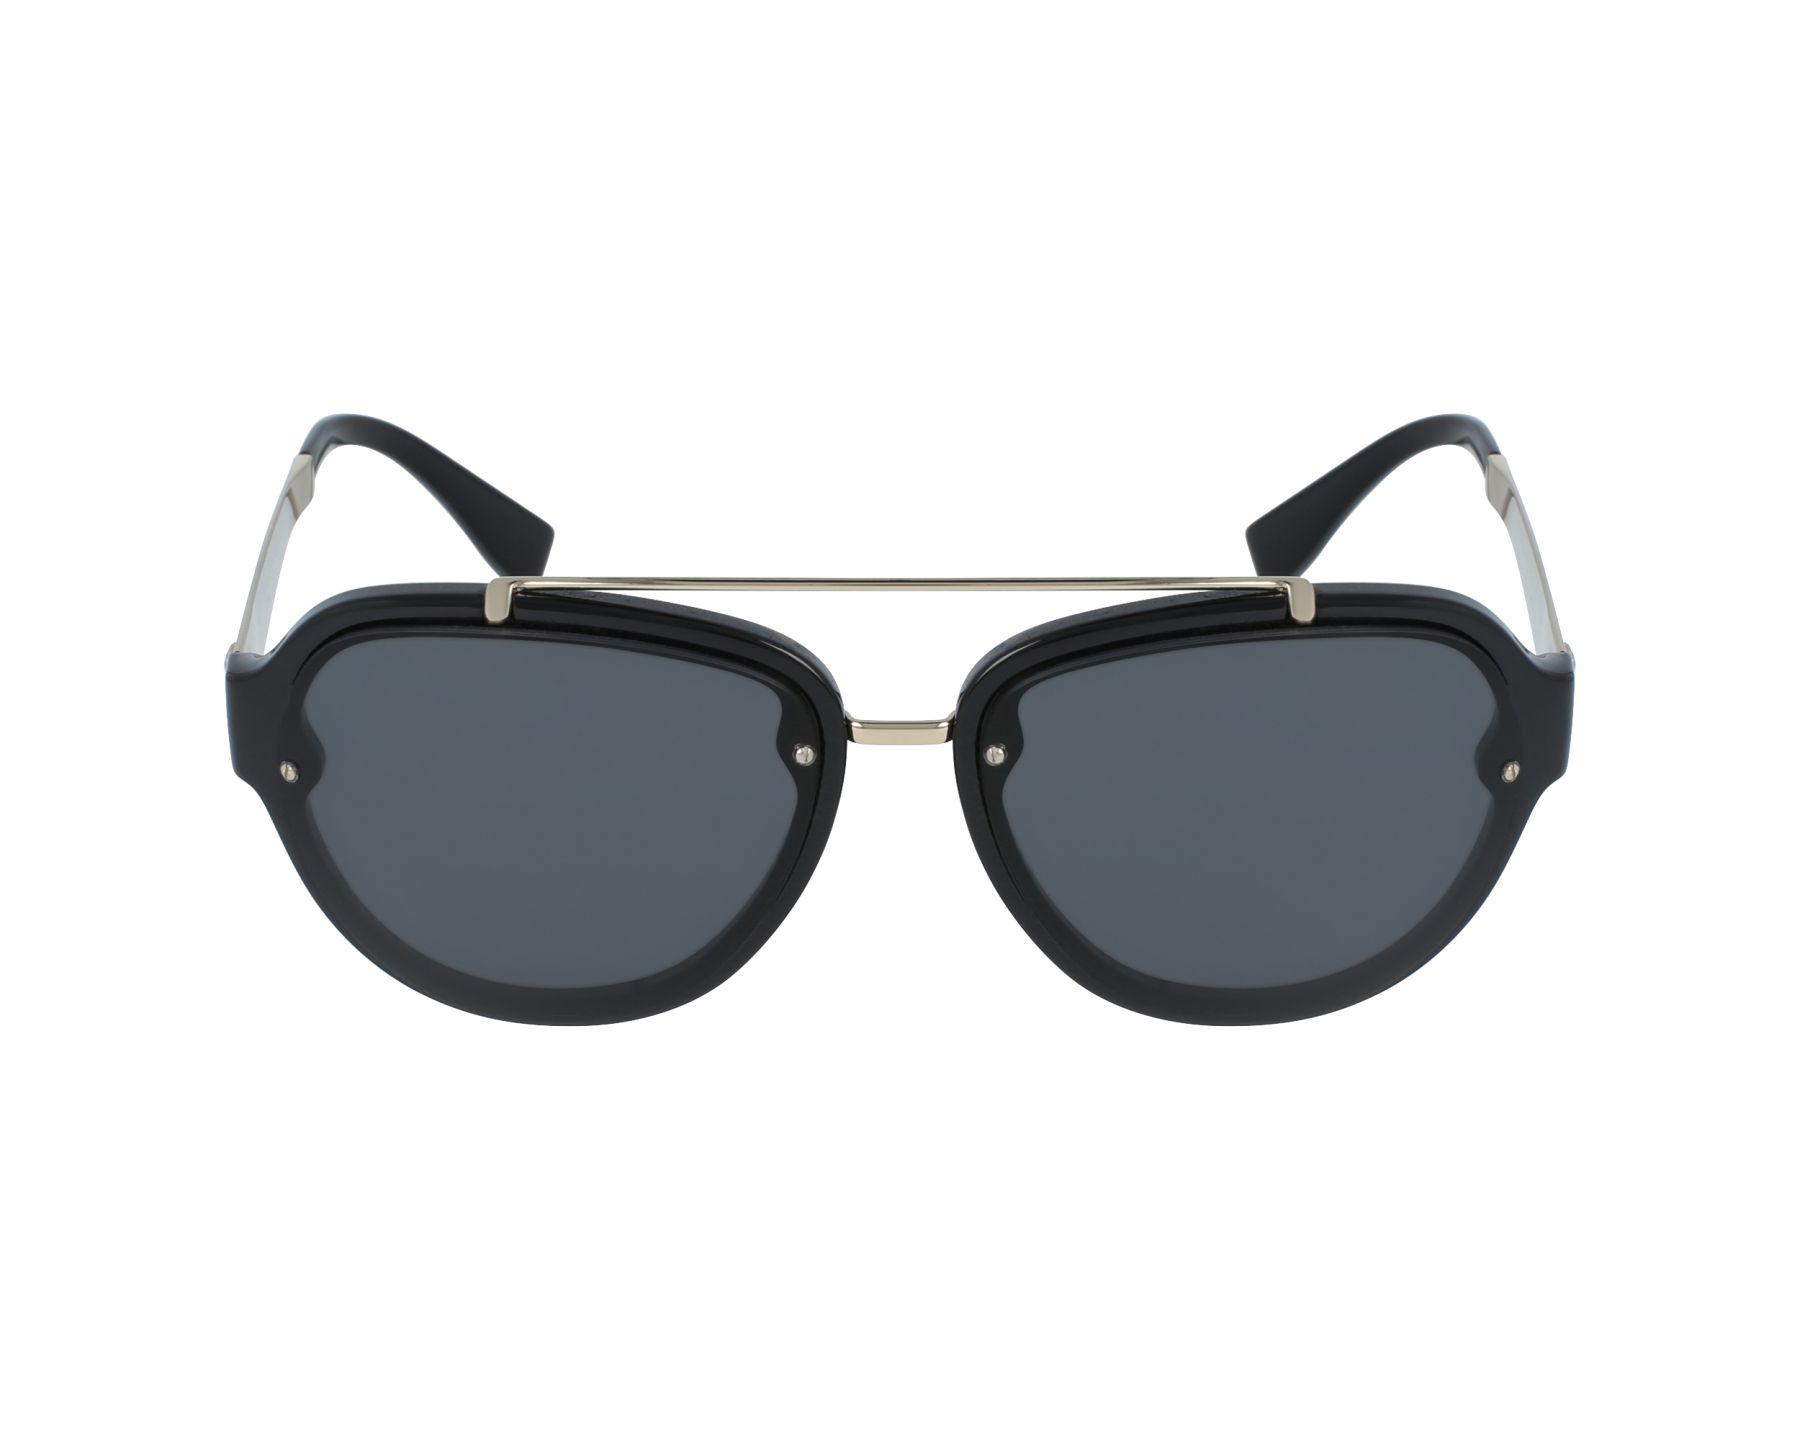 1271099a9c2c Sunglasses Versace VE-4327 GB1 87 57-16 Black Gold profile view